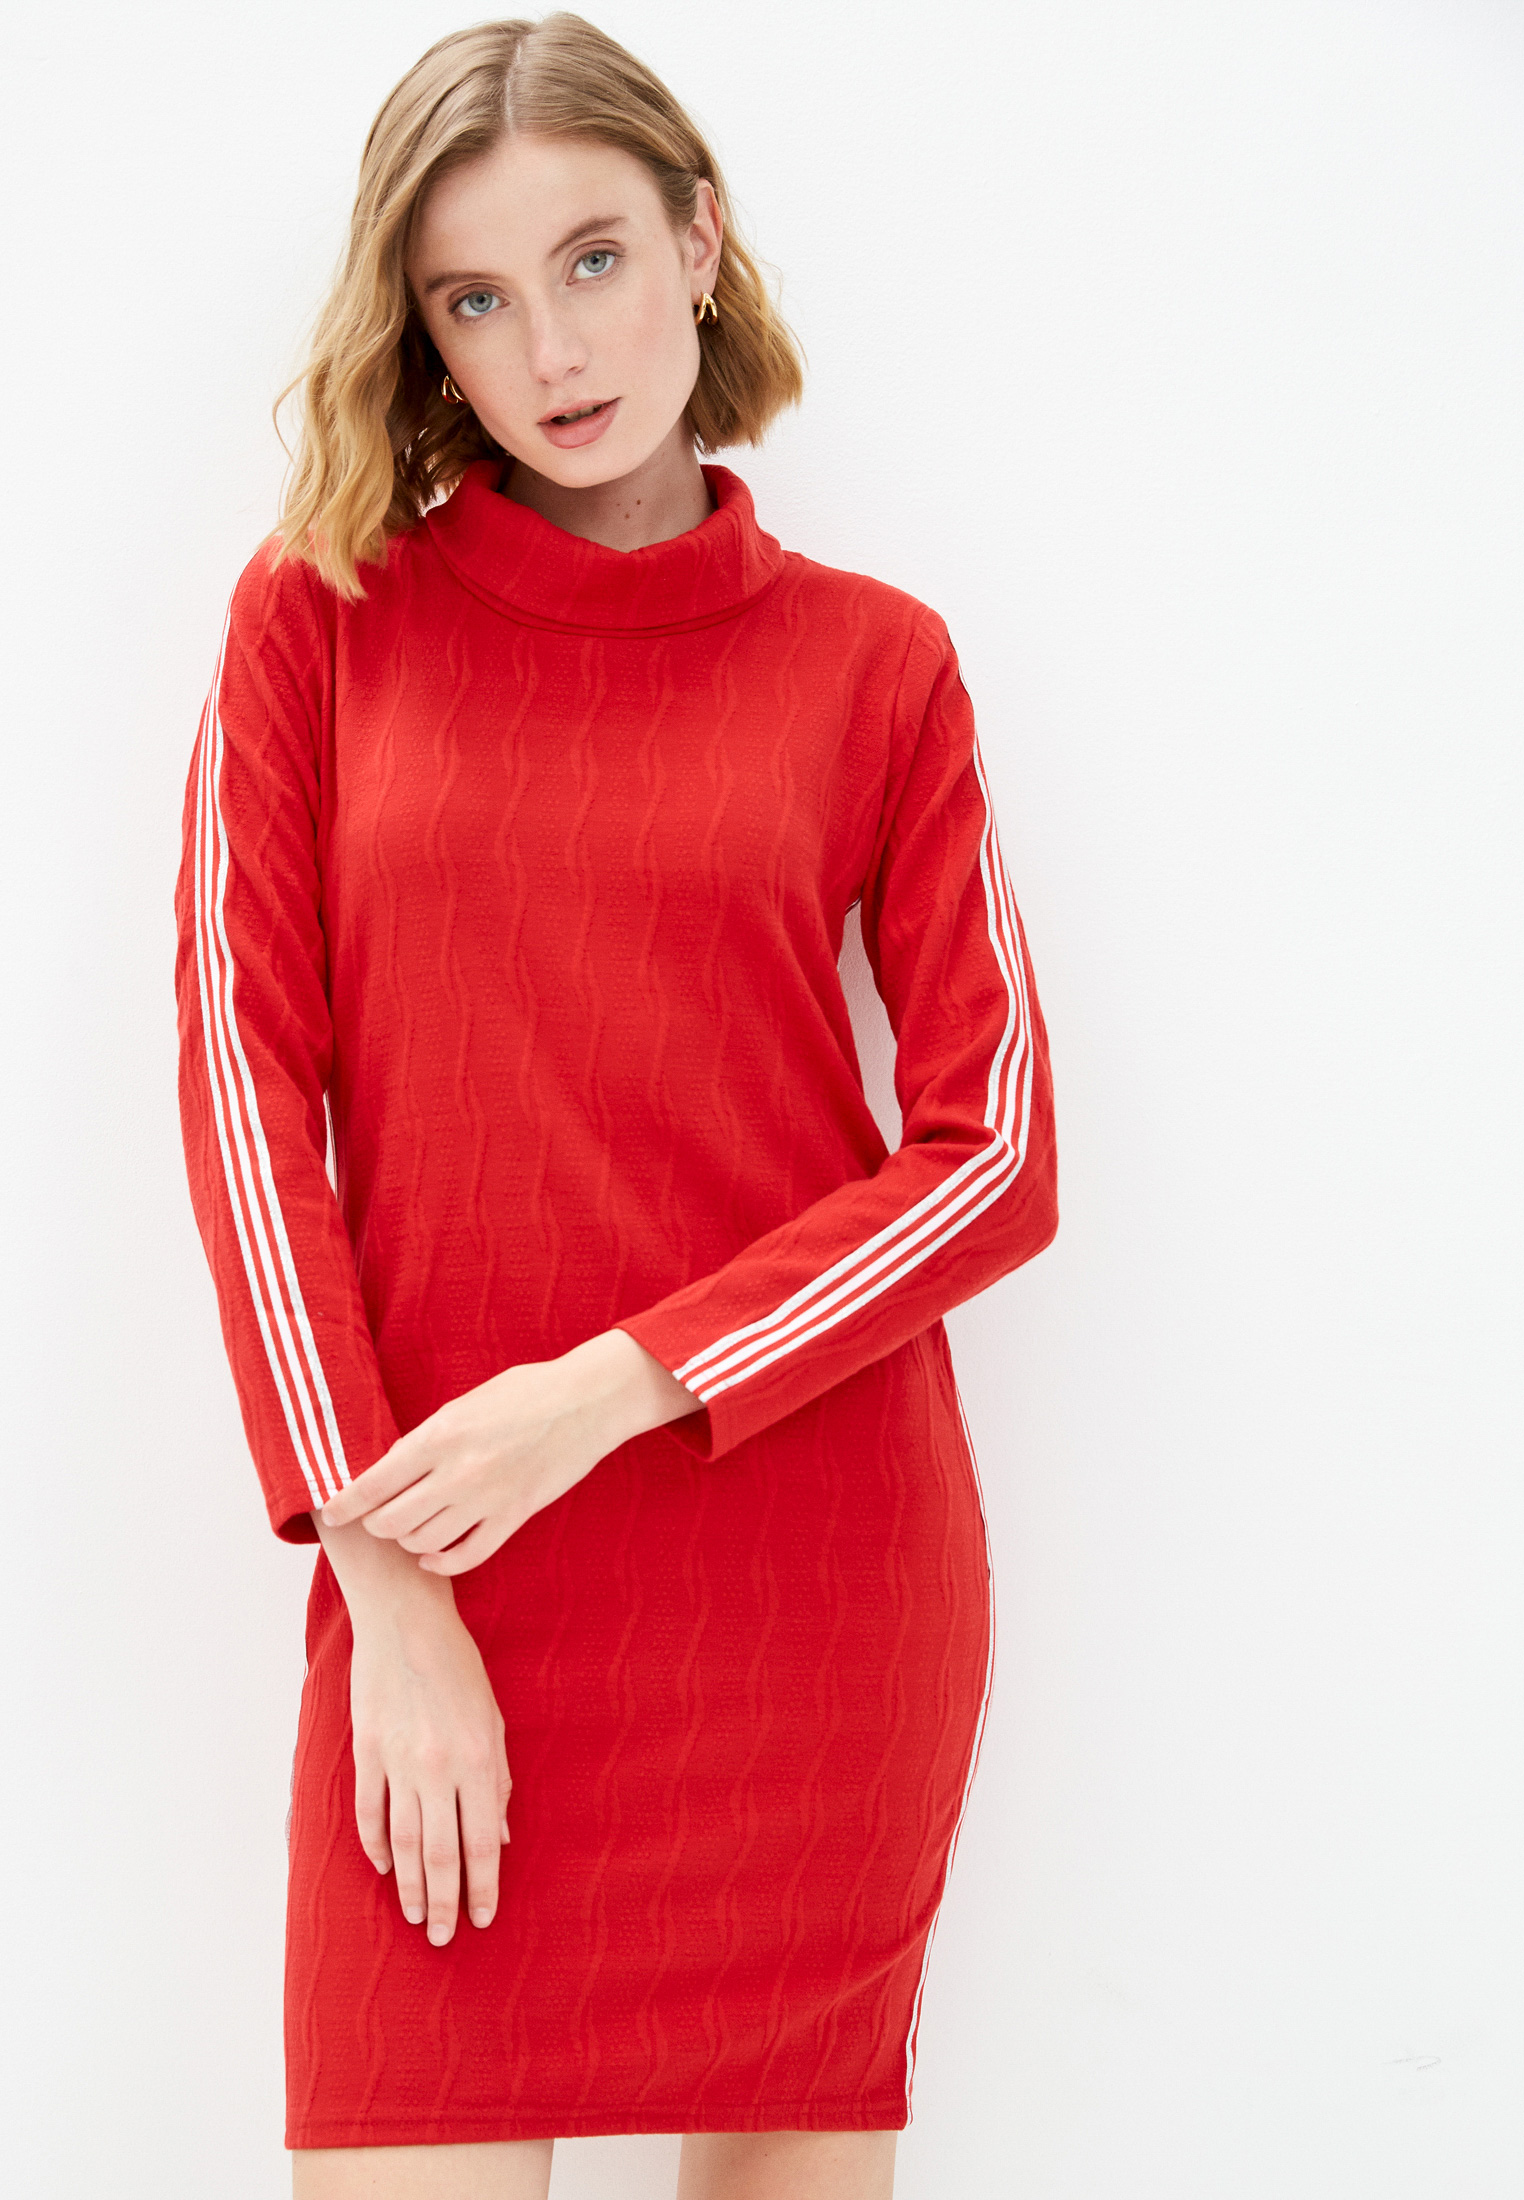 Вязаное платье Pink Orange PO21-0313-2351-1